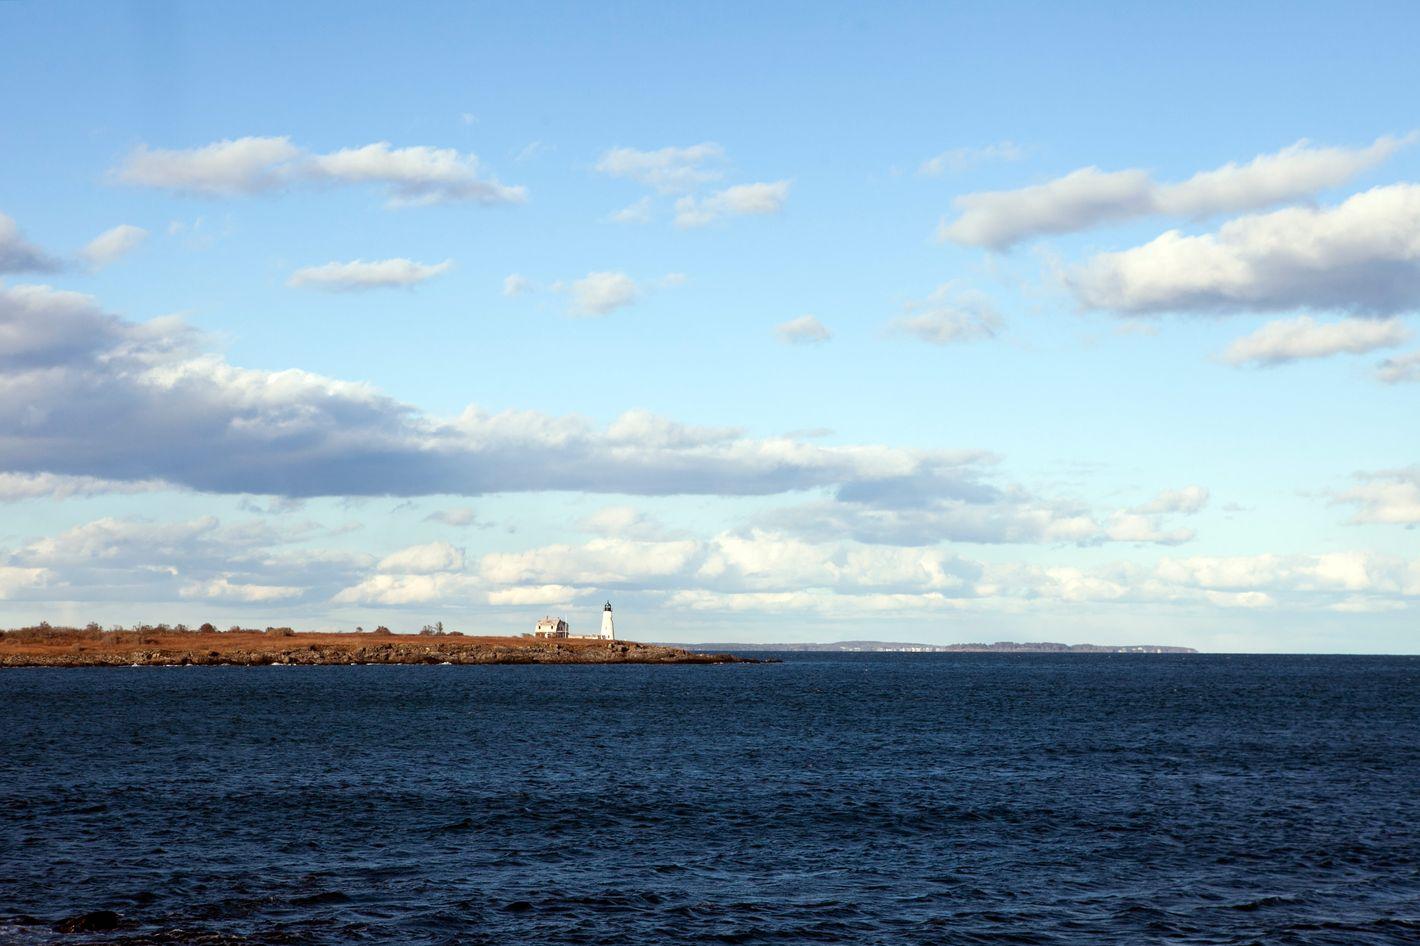 The Maine Coast S Most Beautiful Beach Is At Biddeford Pool